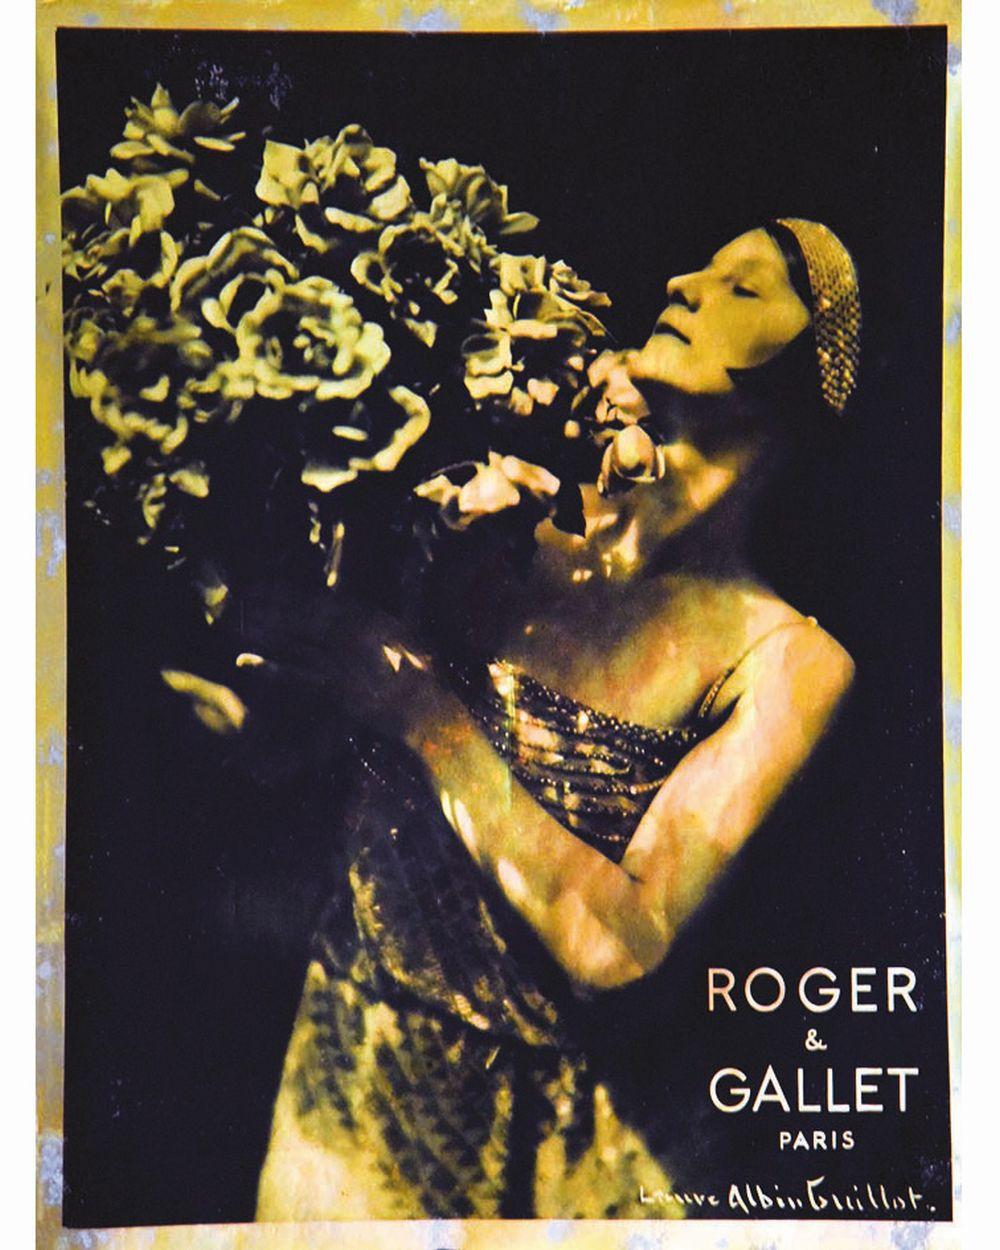 ALBIN GUILLOT LAURE - Roger Gallet     vers 1930  Paris